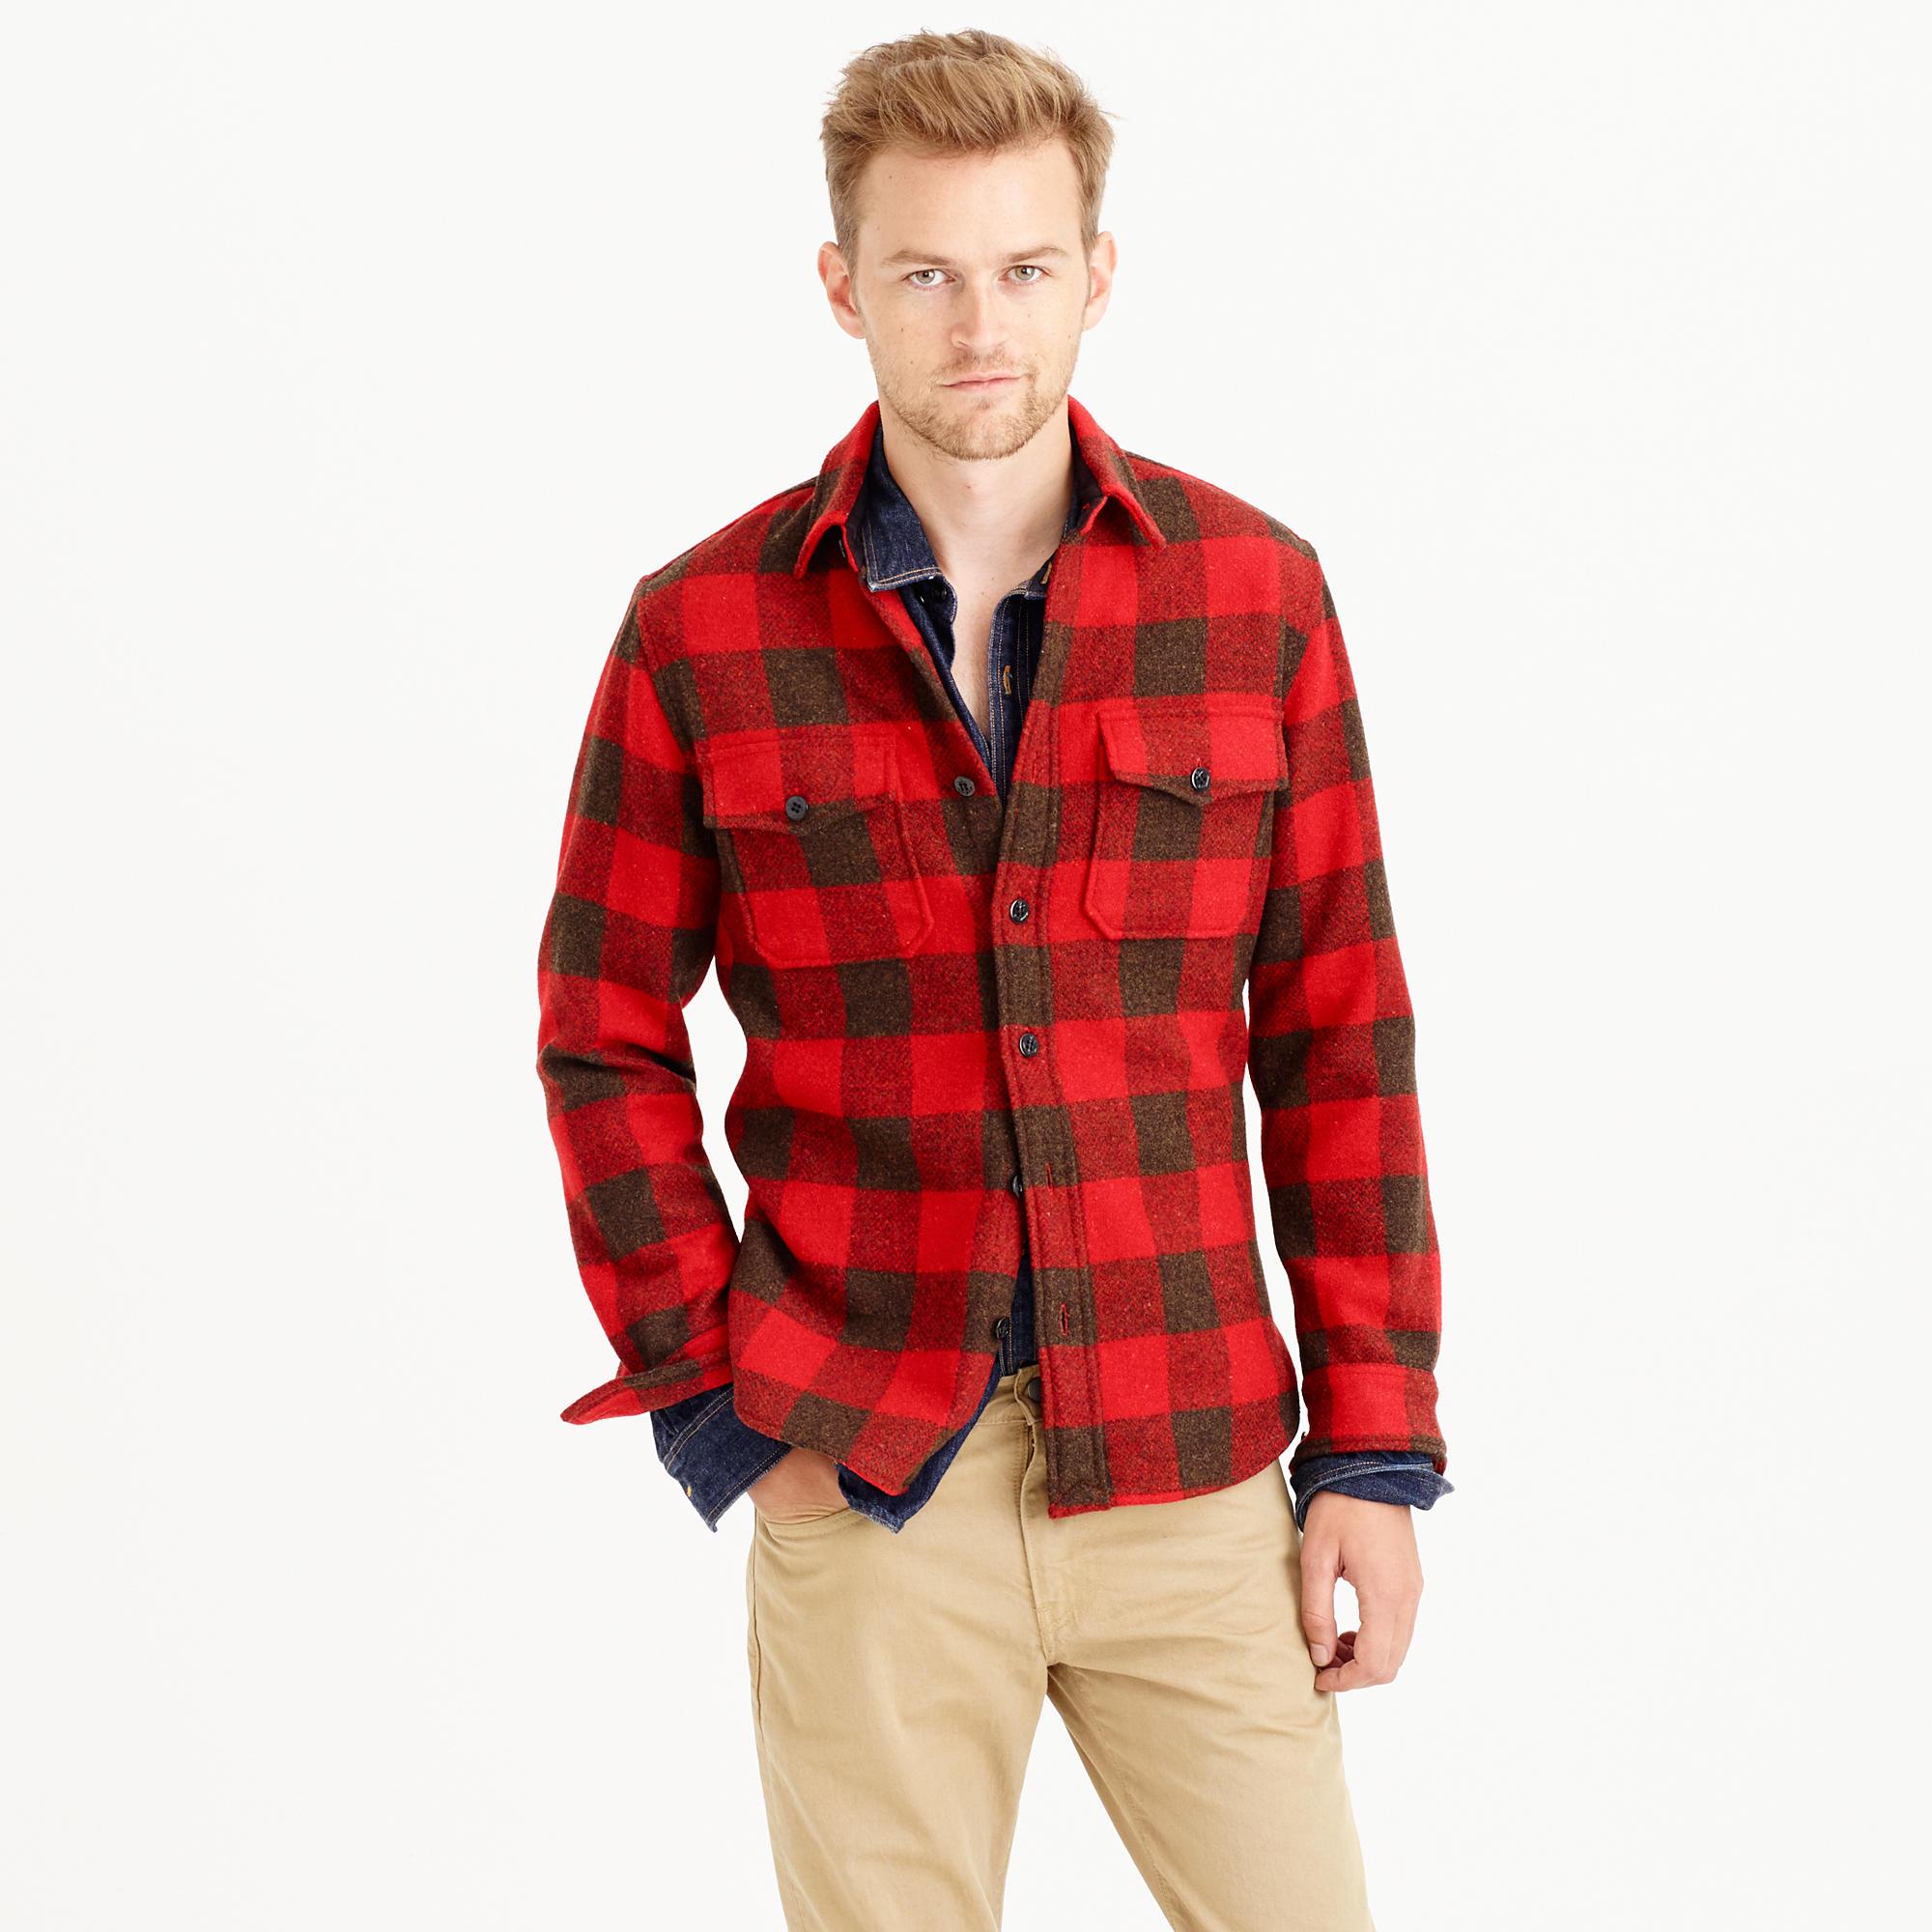 93342801 Wallace & Barnes Buffalo Check Cpo Shirt-jacket | Grailed